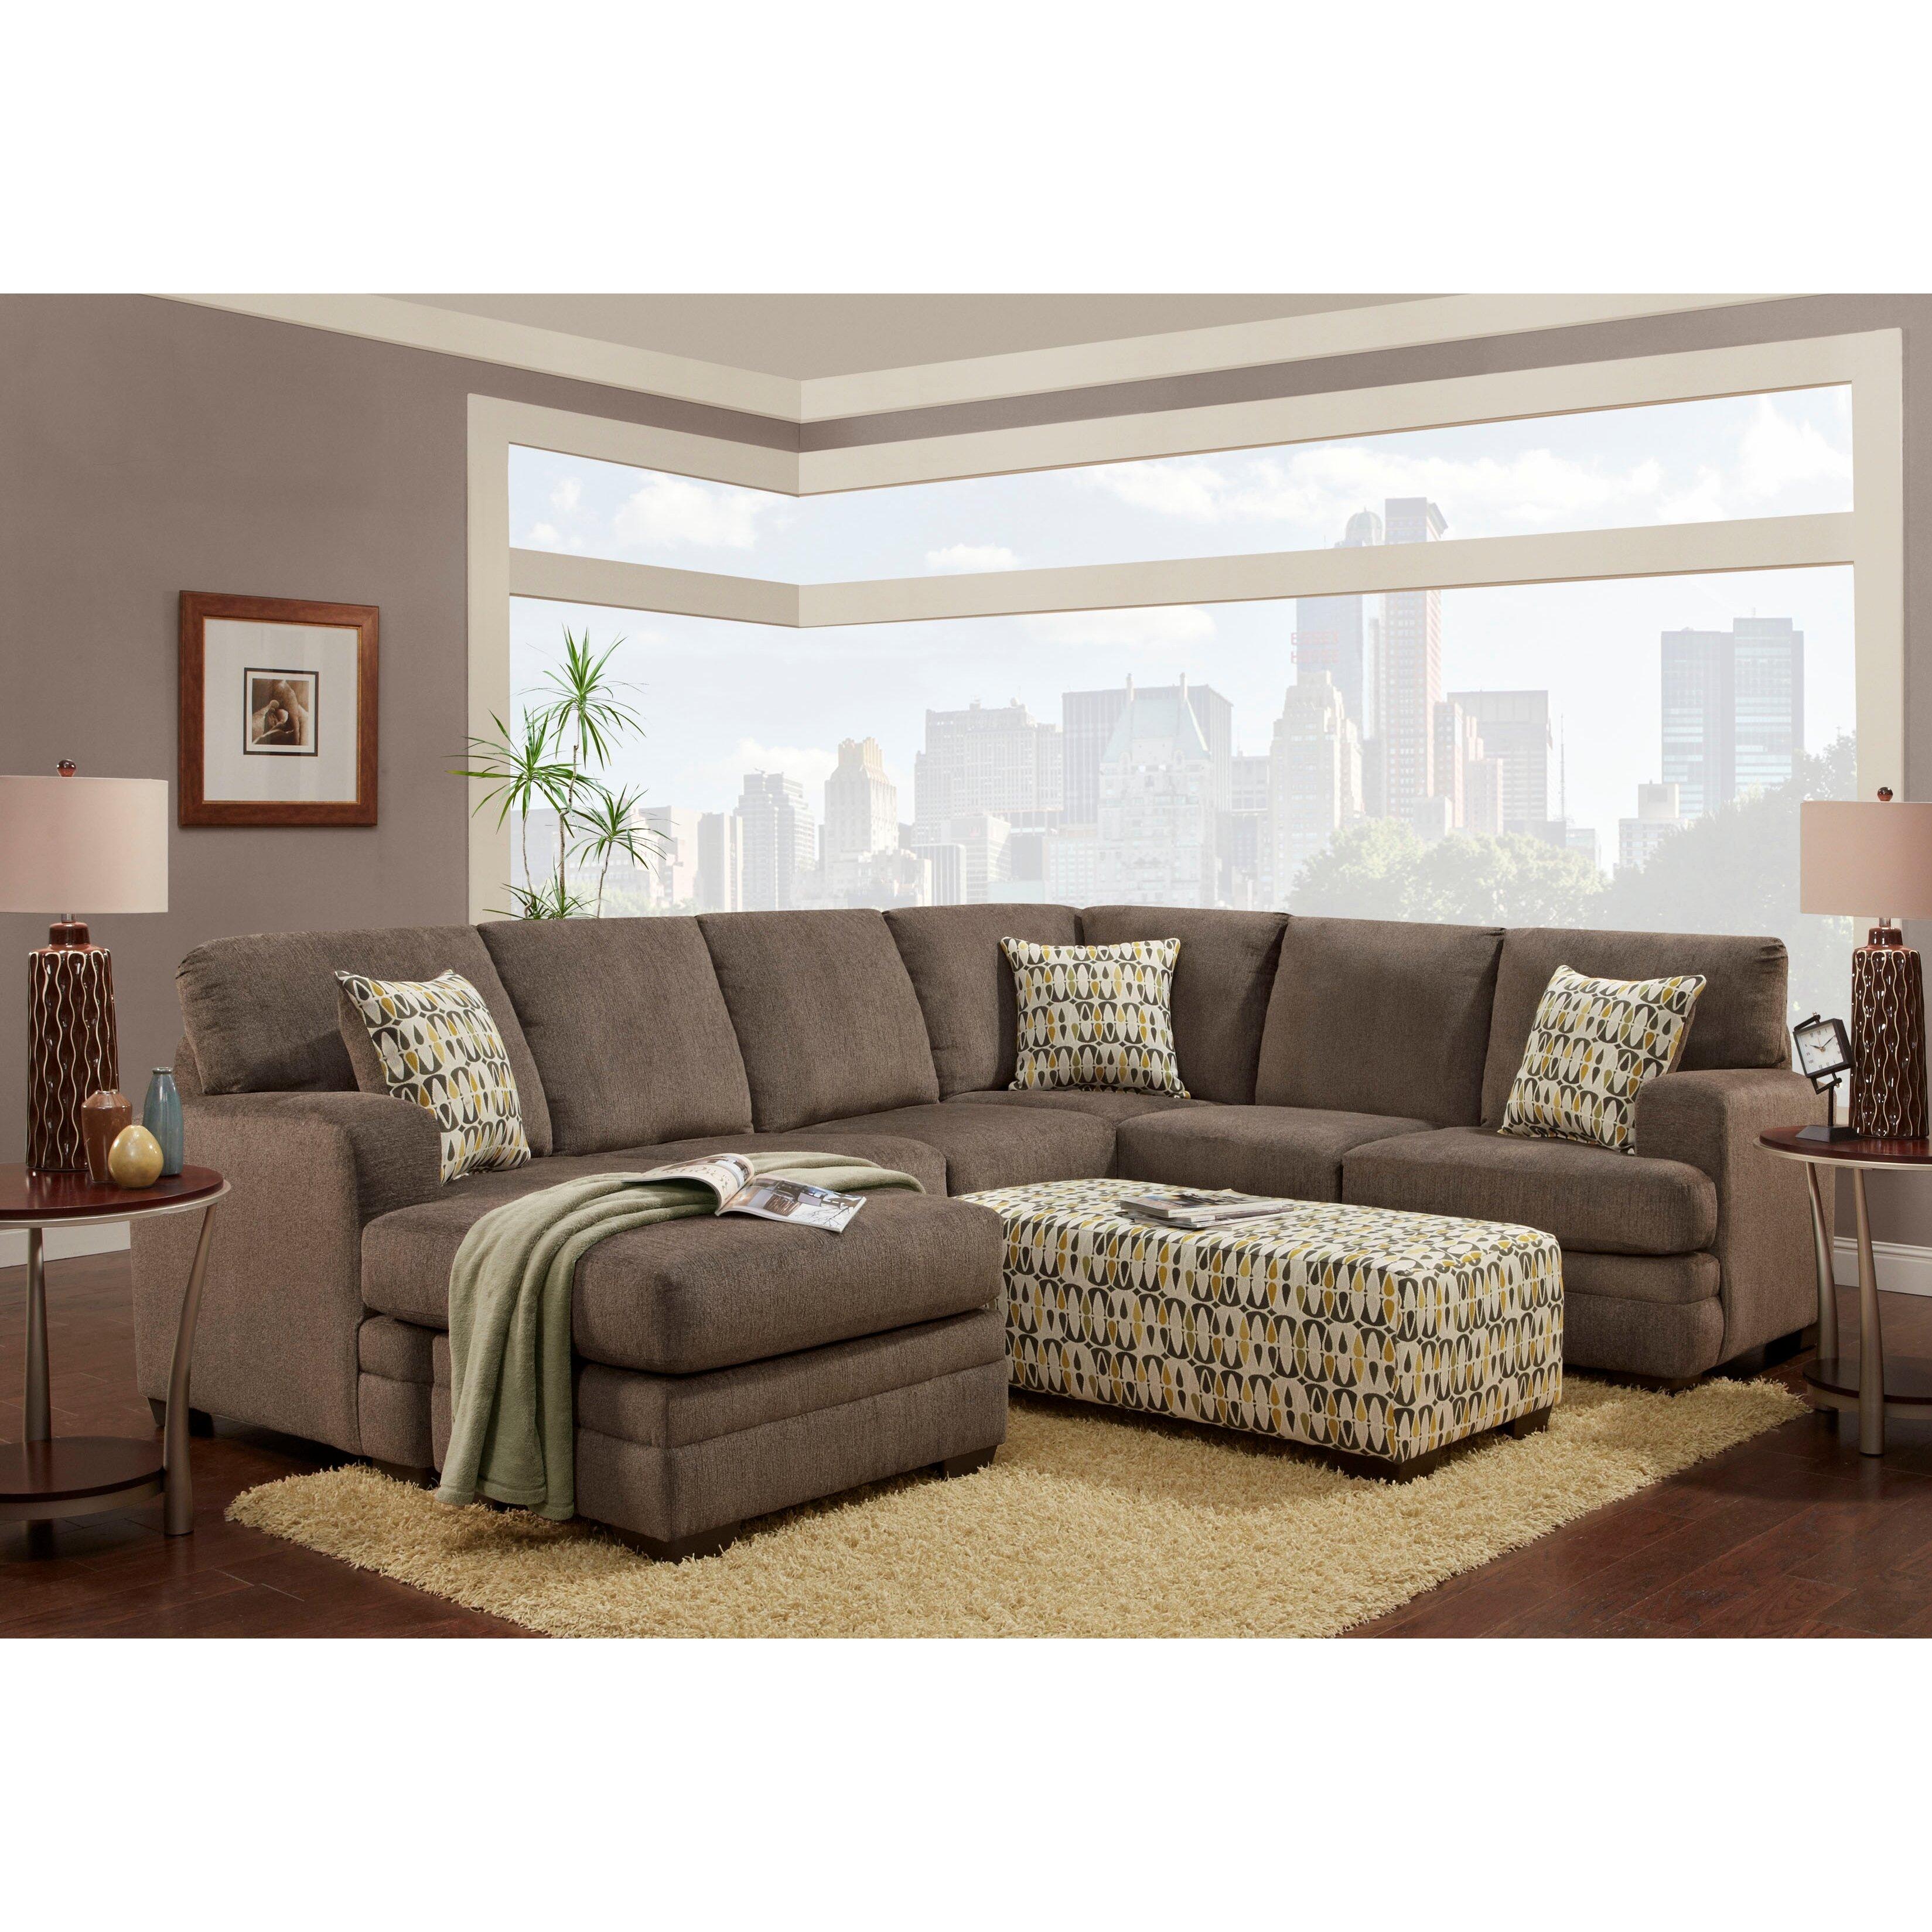 Amazing Wildon Home Bailey Microfiber Sectional Sofa Sectional Sofas